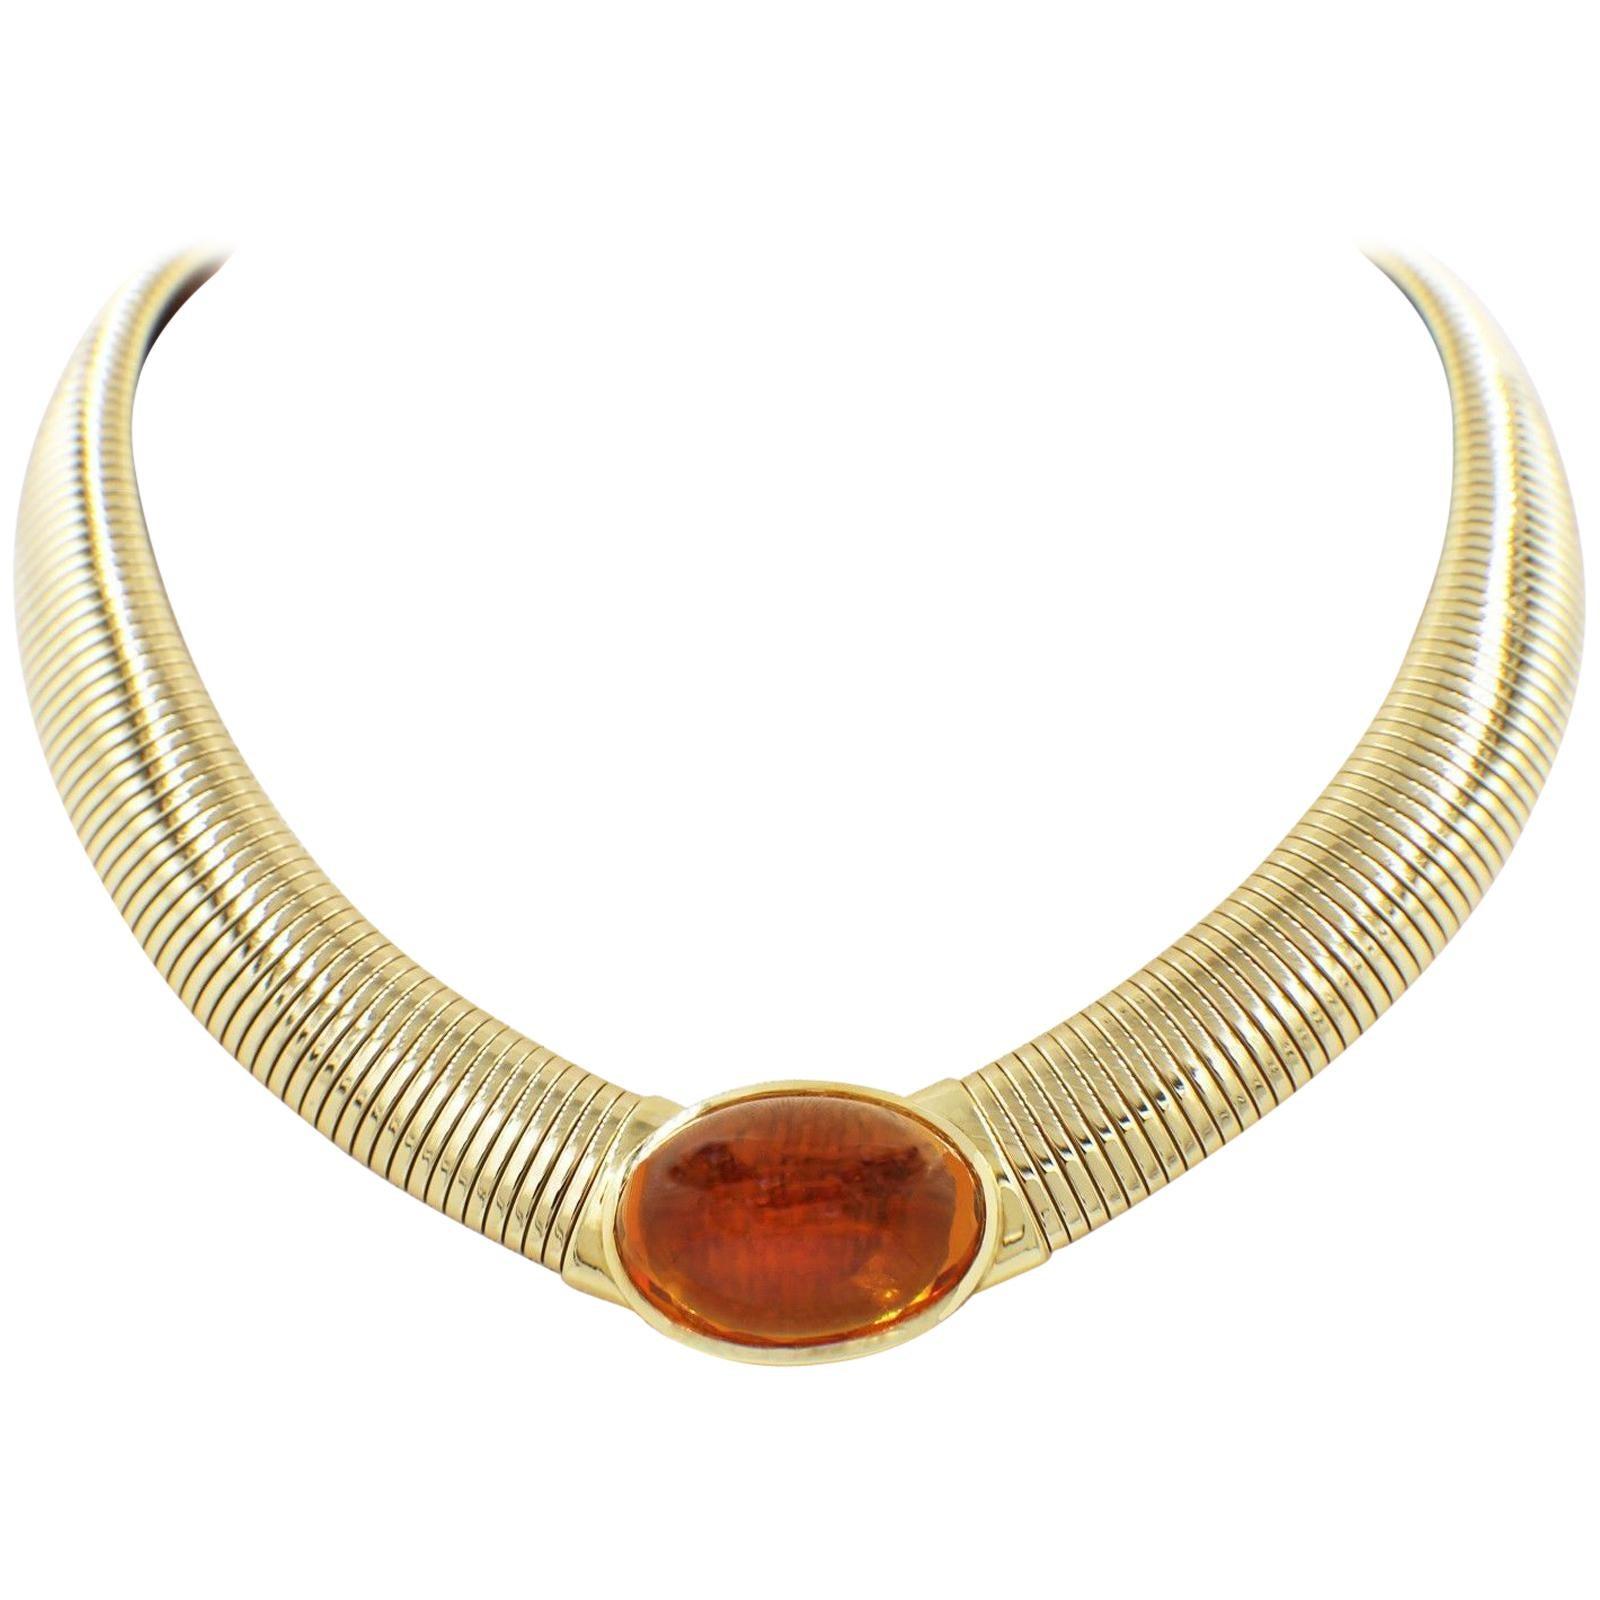 Vintage Cartier Amber Cabochon Collar Necklace 18 Karat Yellow Gold